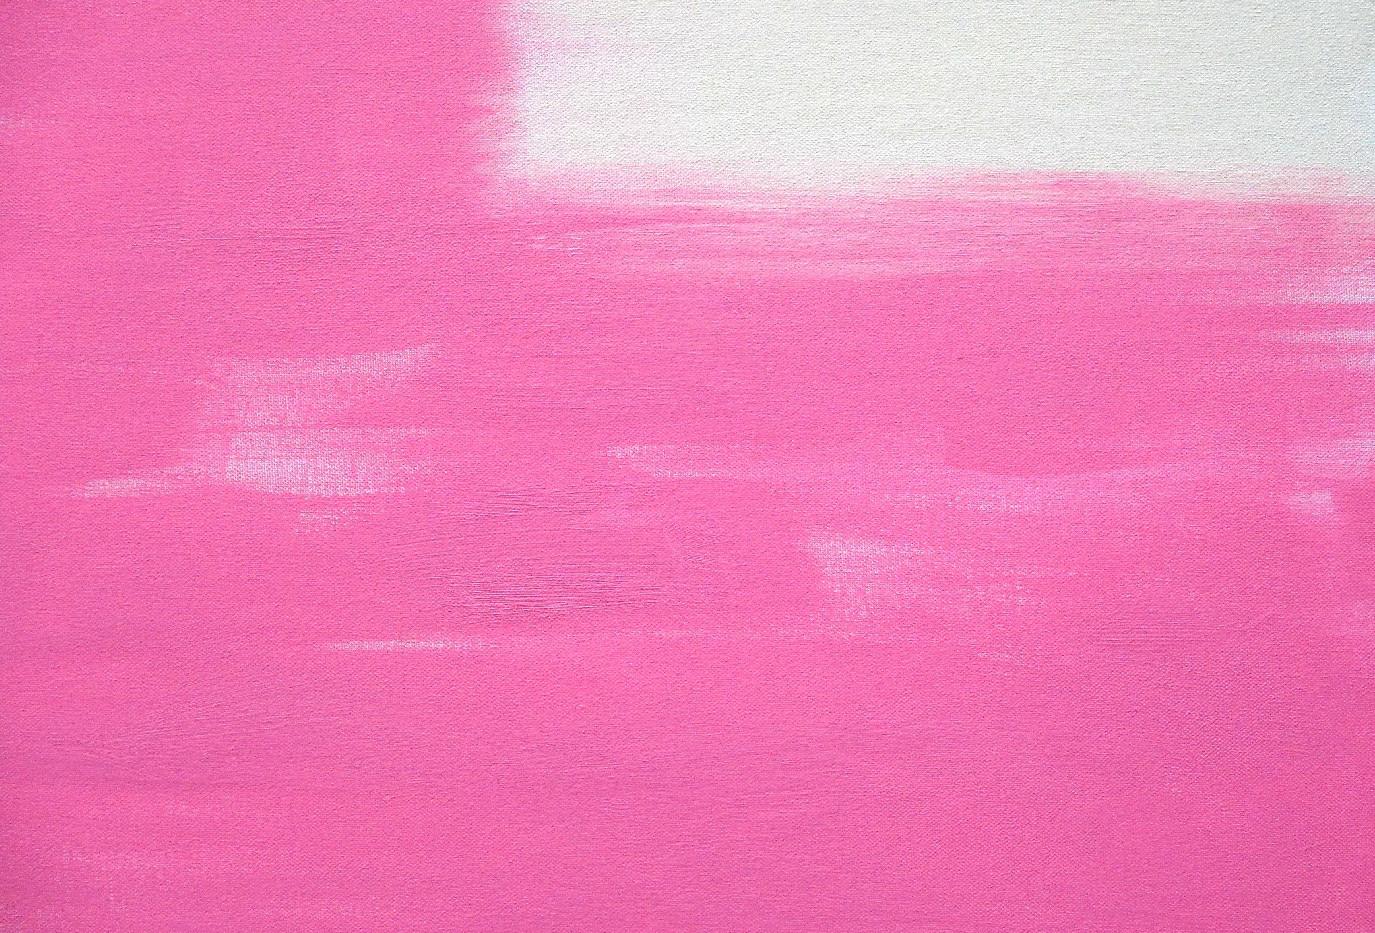 SuperPopBoy_abstract_paintin_beavis_Butt